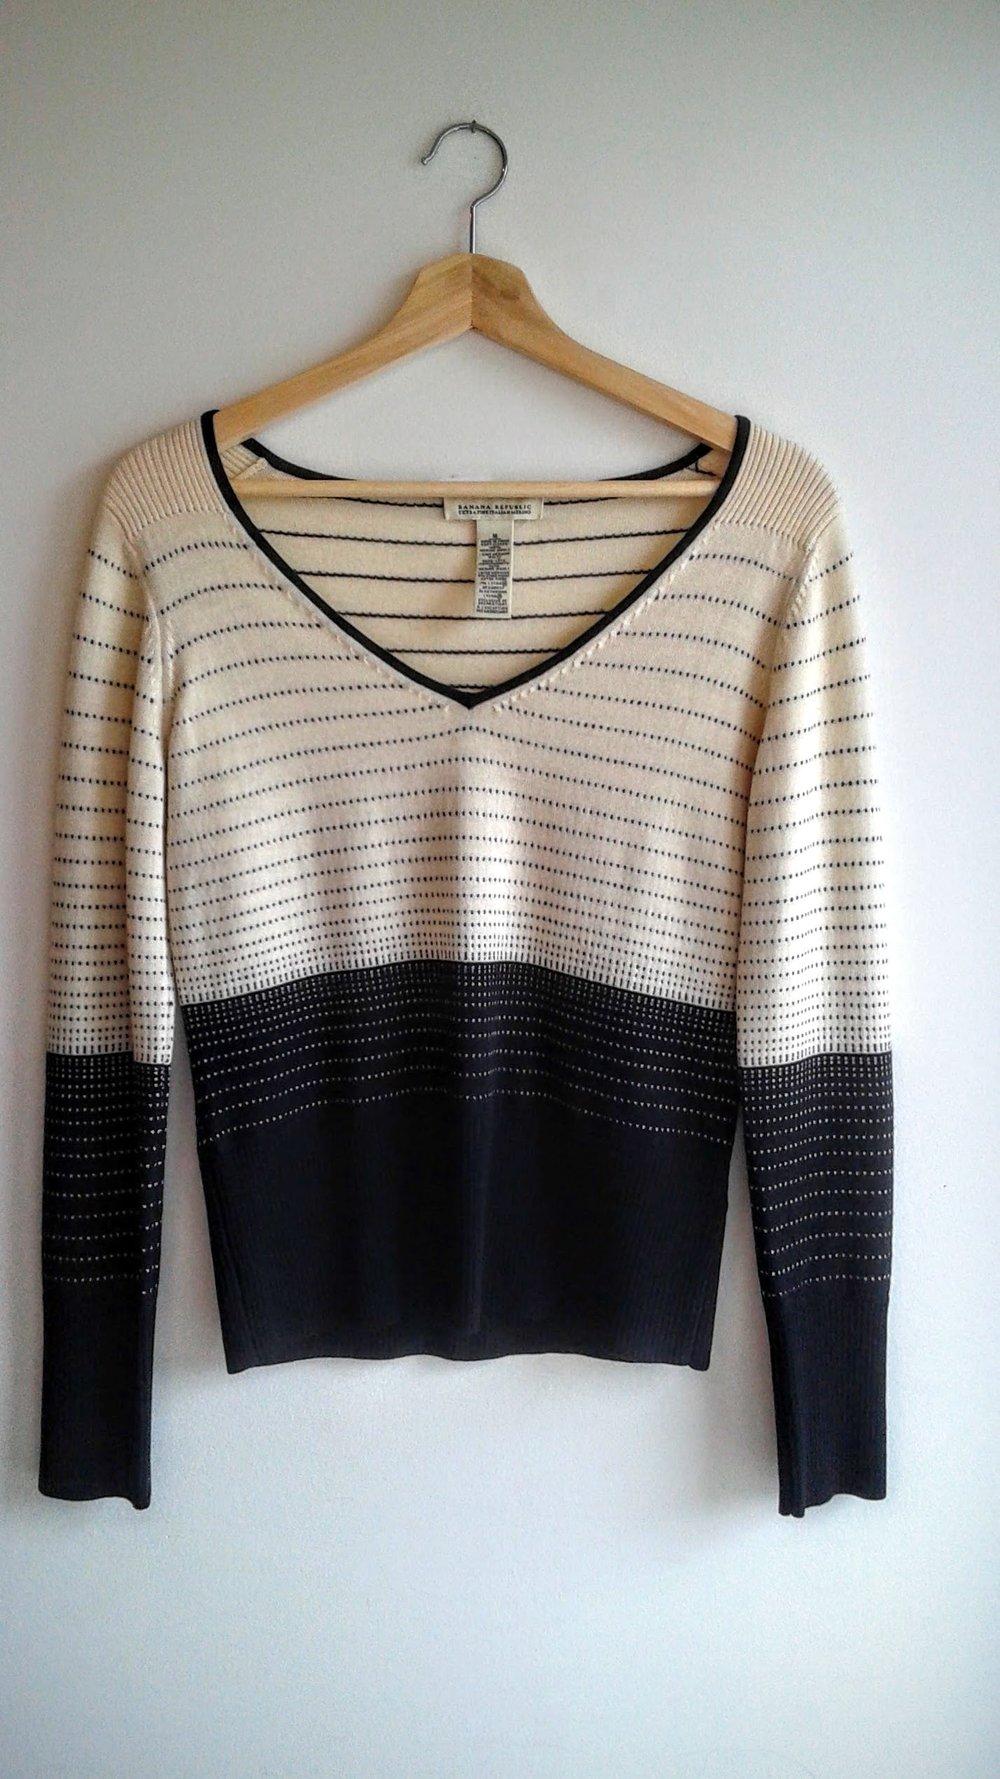 Banana Republic  sweater; Size M, $26